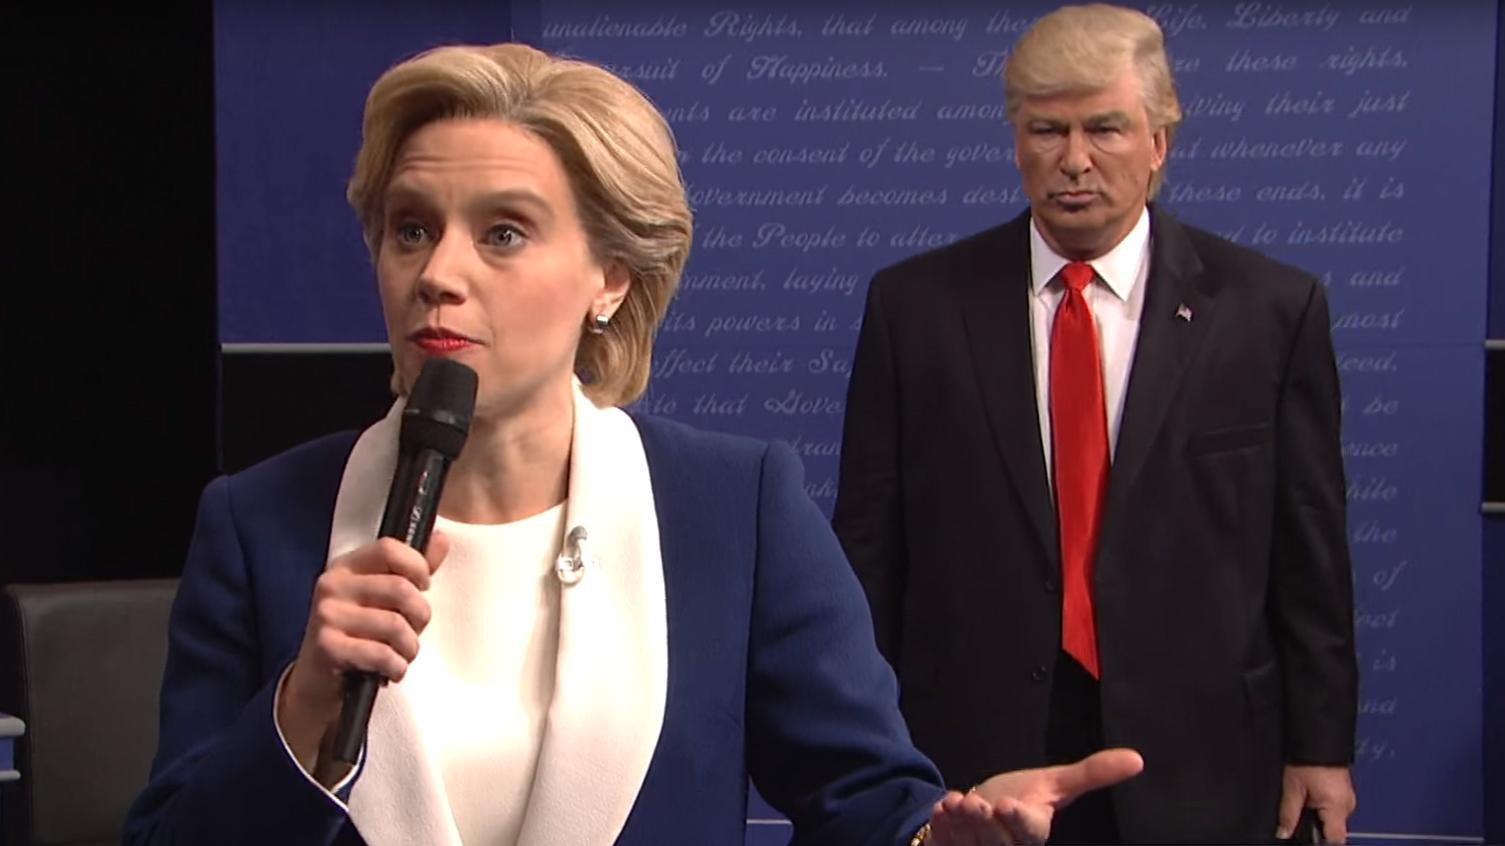 Kate McKinnon Hillary Clintont és Alec Baldwin Donald Trumpot alakítja a Saturday Night Live-ban   Fotó: independent.co.uk